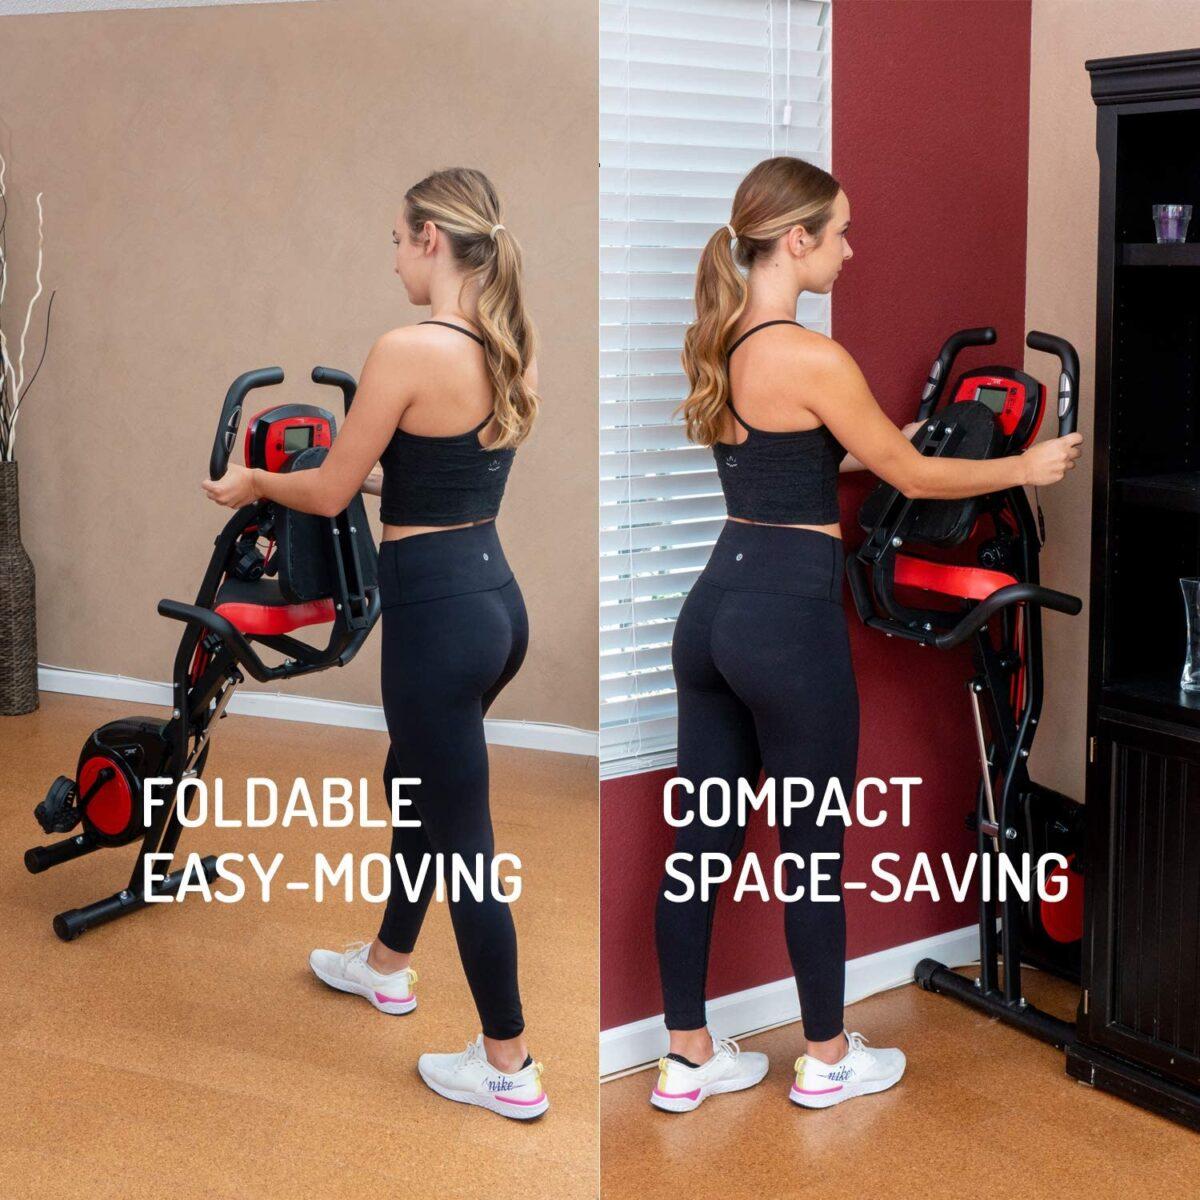 YYFITT 2 in 1 Foldable Fitness Exercise Bike folded away for storage space saving